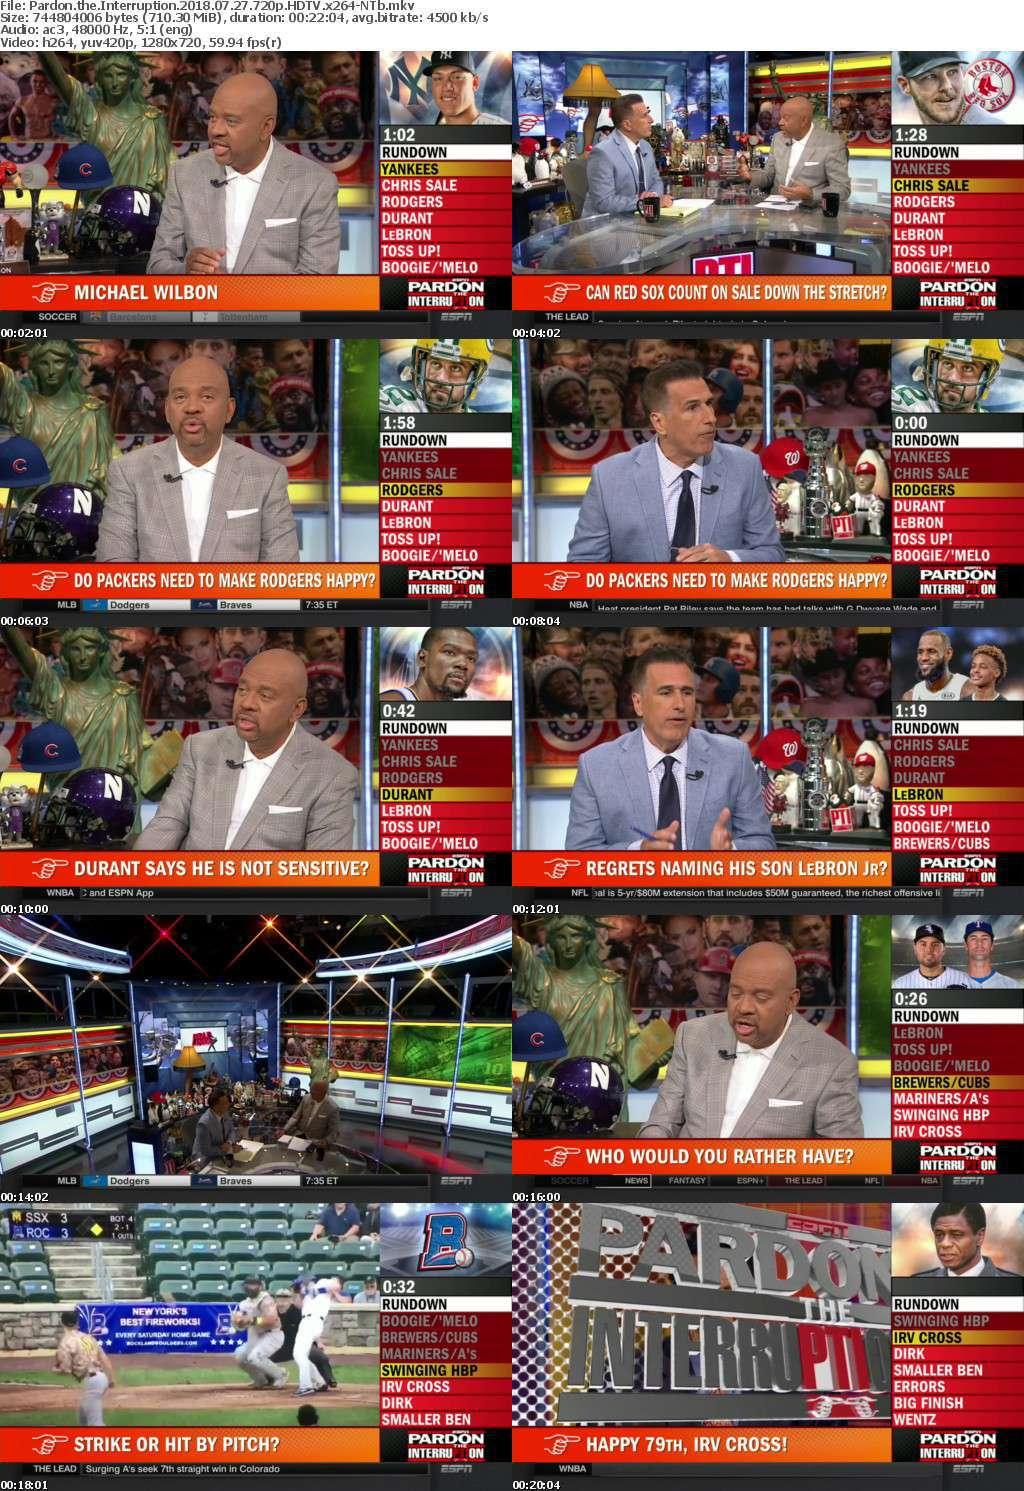 Pardon the Interruption 2018 07 27 720p HDTV x264-NTb